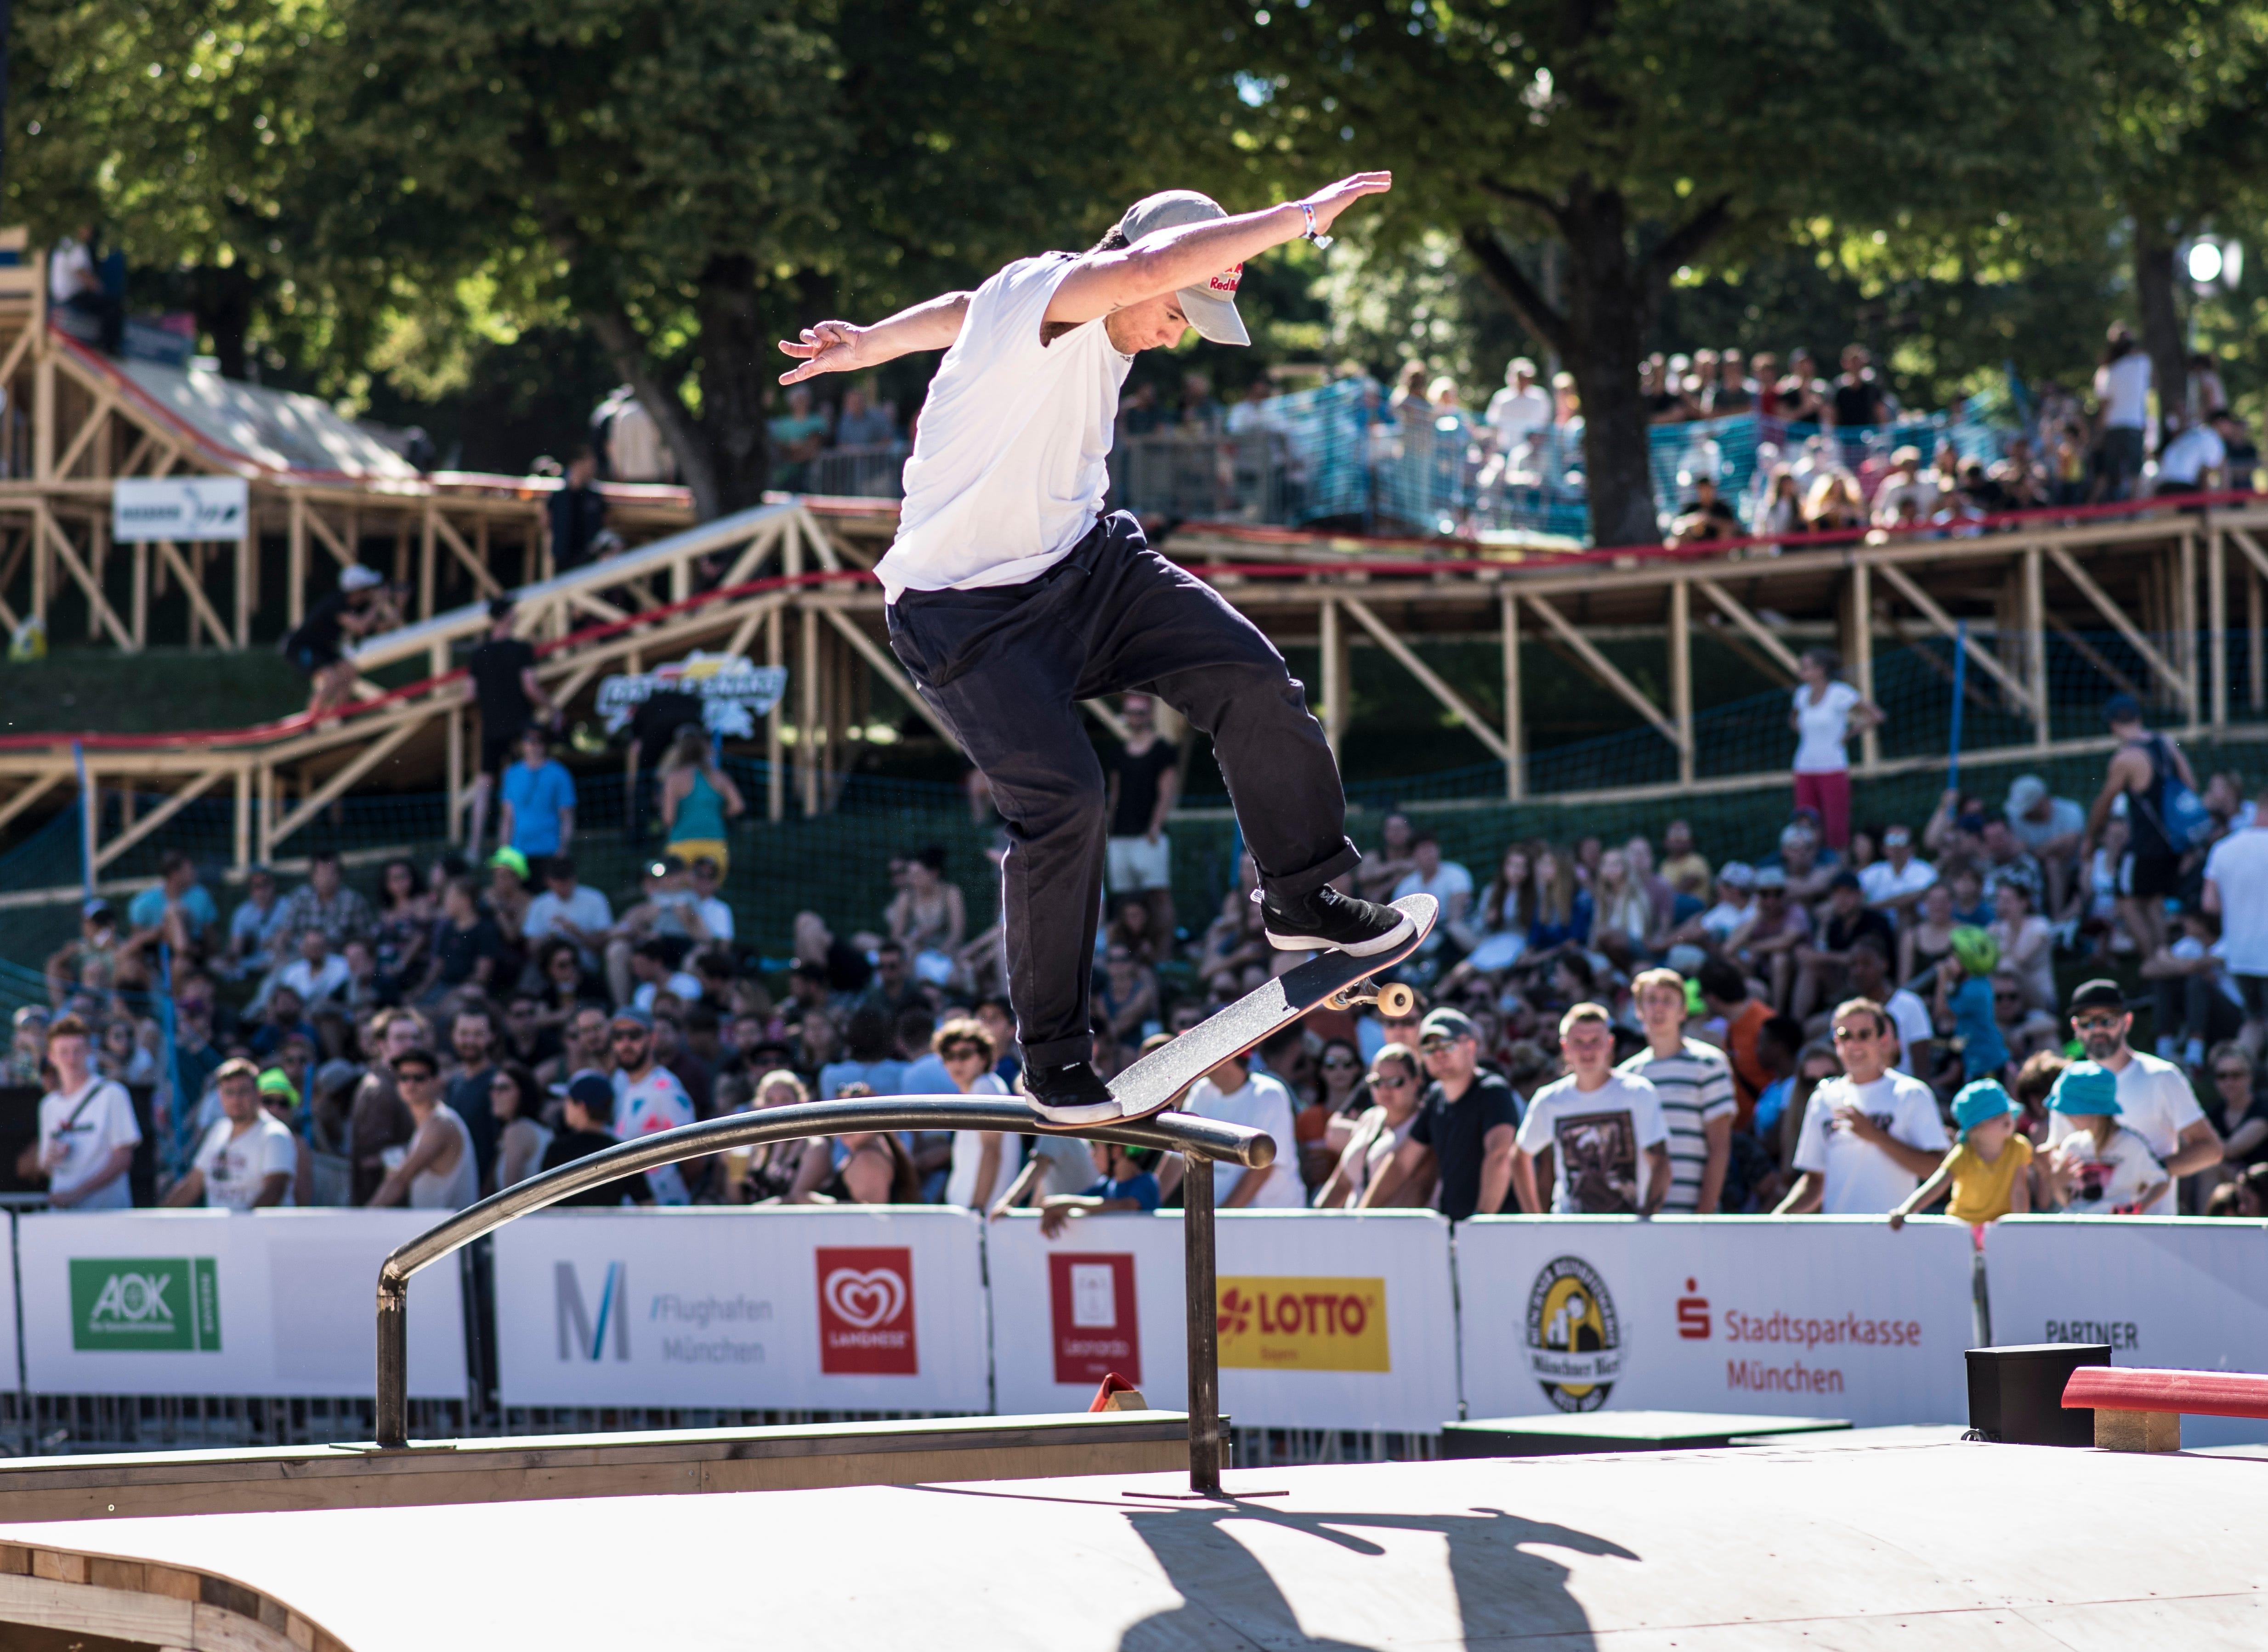 Skater Alex Sorgente describing his sport